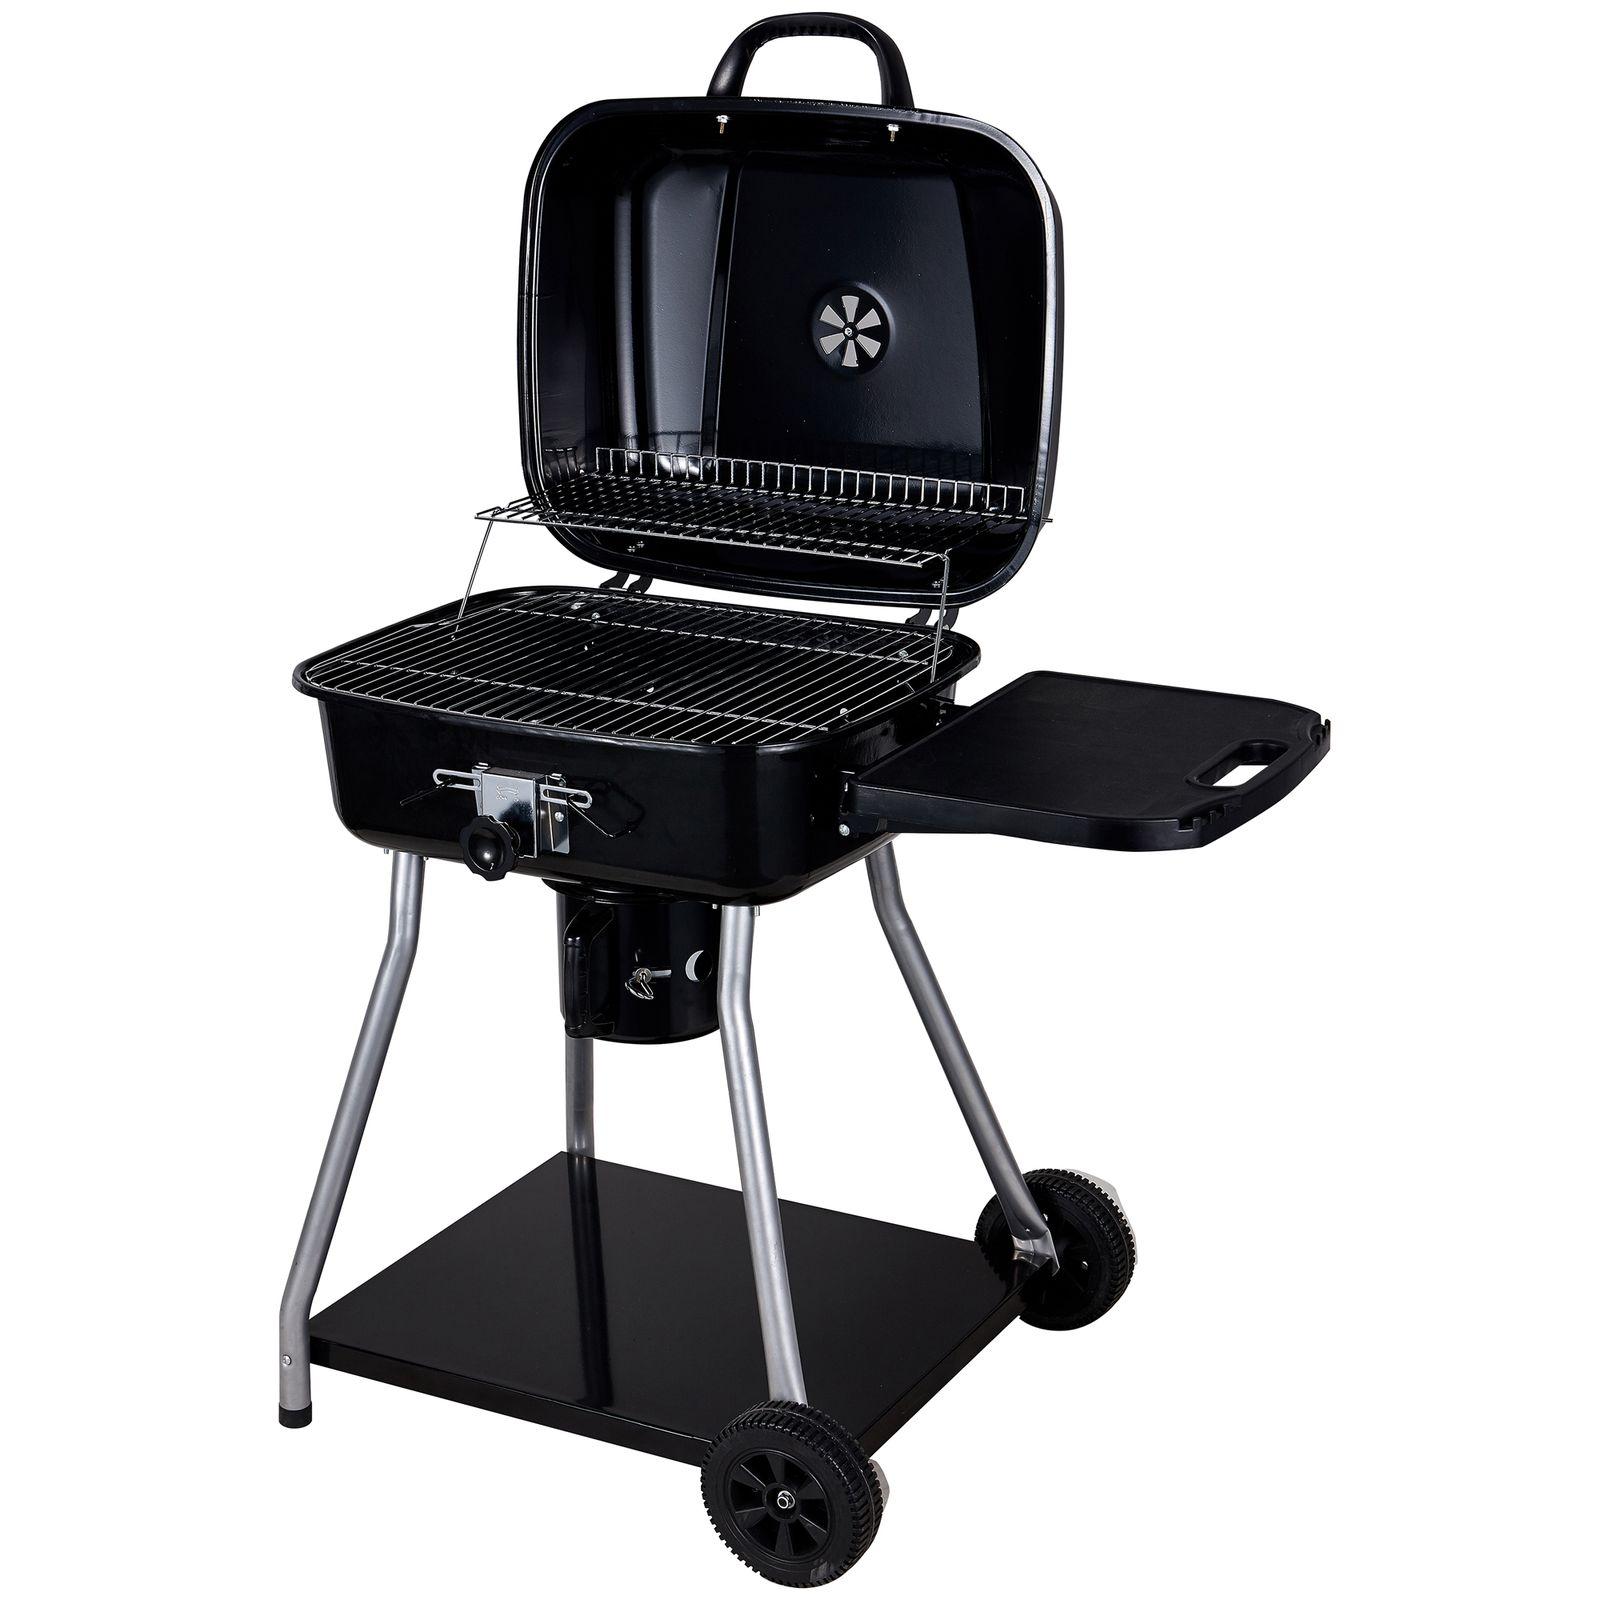 Barbecue avec couvercle 102 x 57 x 95 cm PATIO